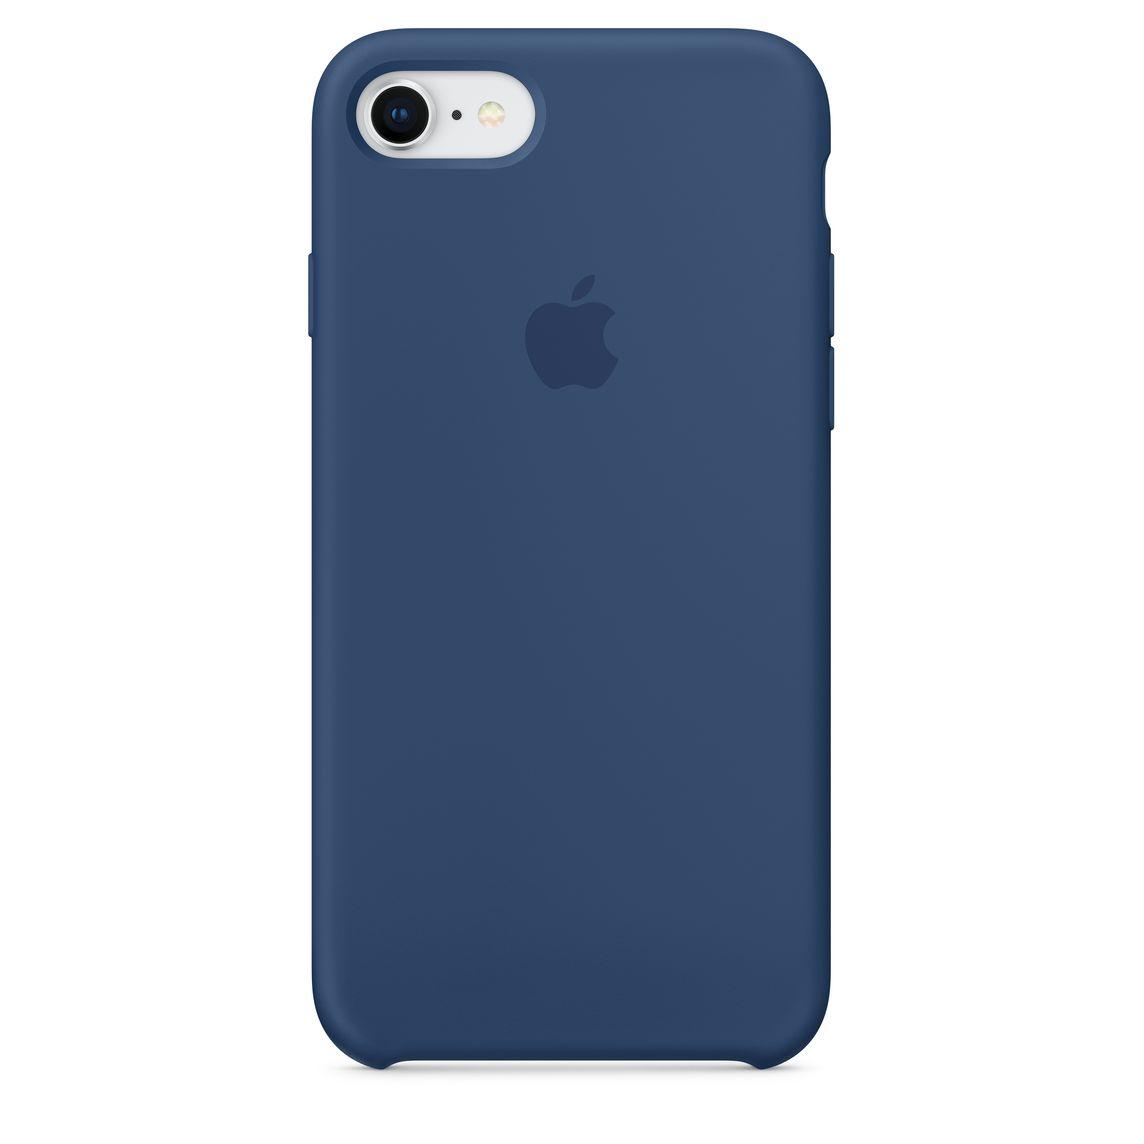 timeless design 8d883 7c15e iPhone 8 / 7 Silicone Case - Blue Cobalt